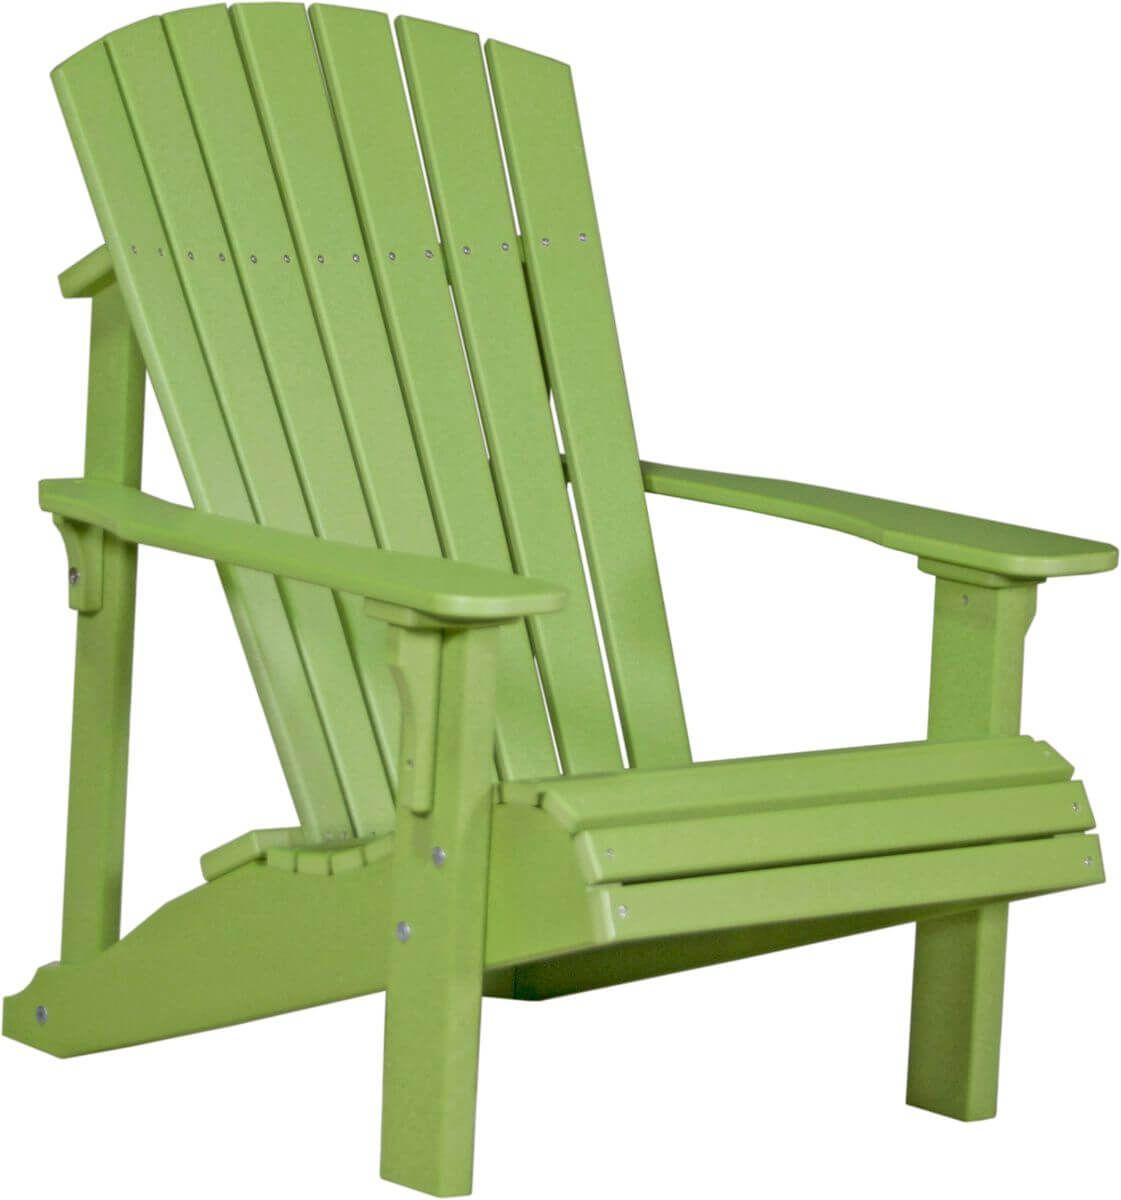 Lime Green Rockaway Adirondack Chair